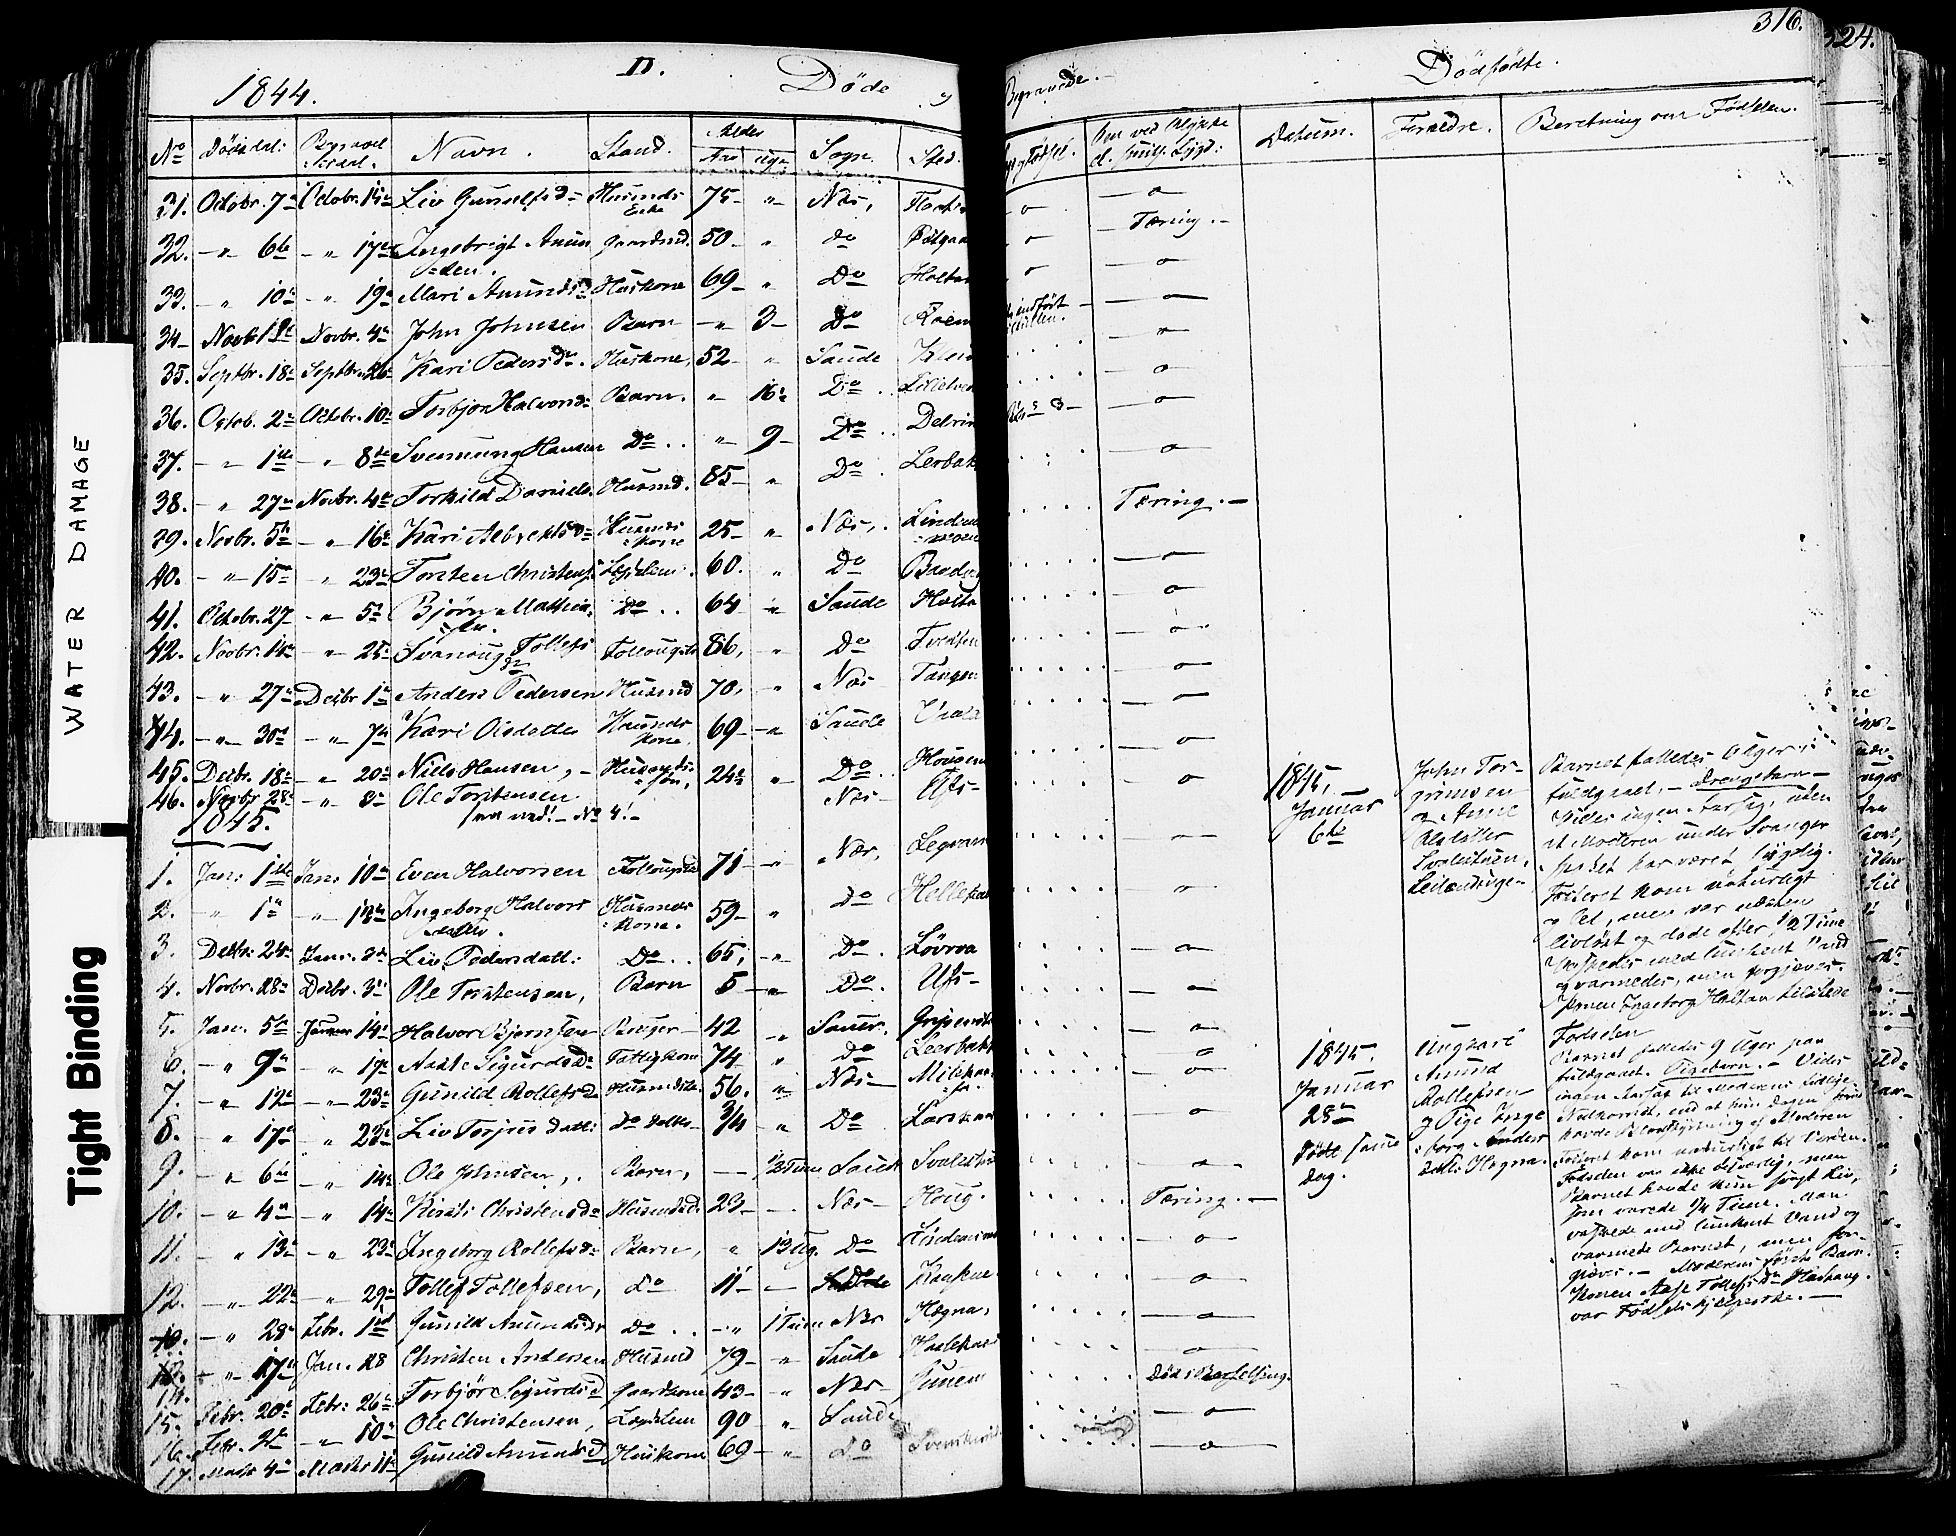 SAKO, Sauherad kirkebøker, F/Fa/L0006: Ministerialbok nr. I 6, 1827-1850, s. 316